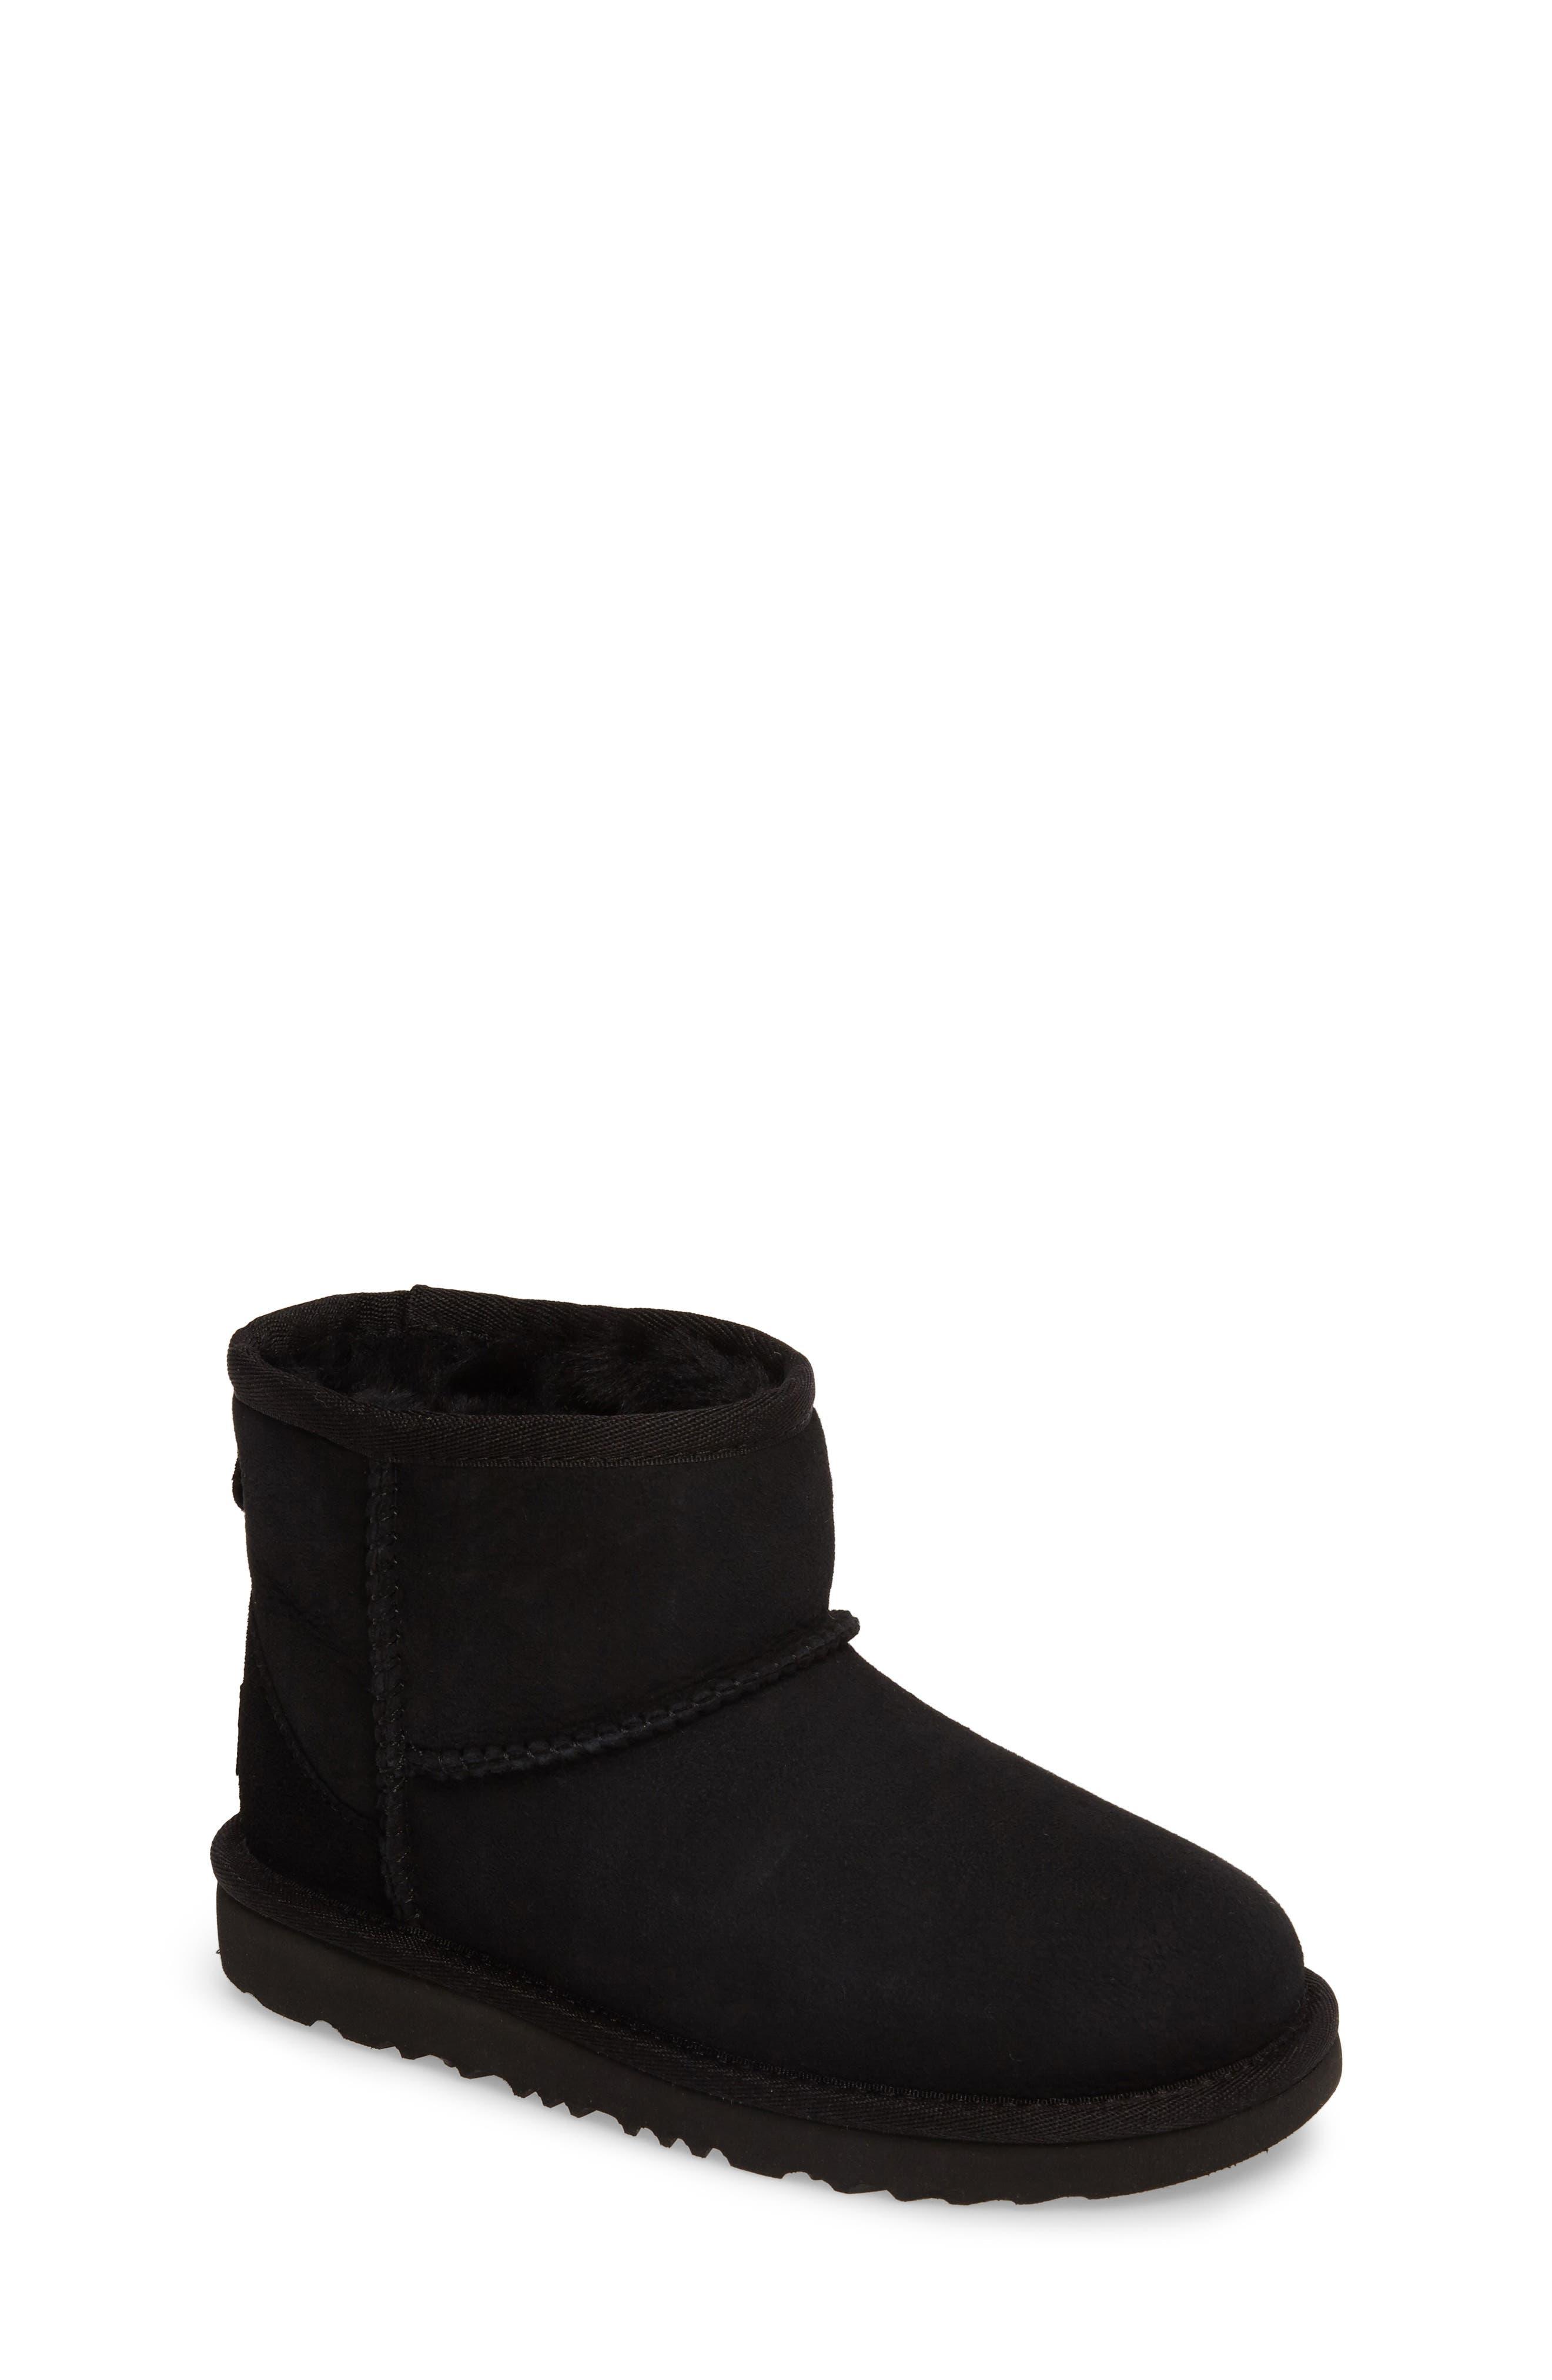 UGG<SUP>®</SUP> Classic Mini II Water-Resistant Genuine Shearling Boot, Main, color, BLACK